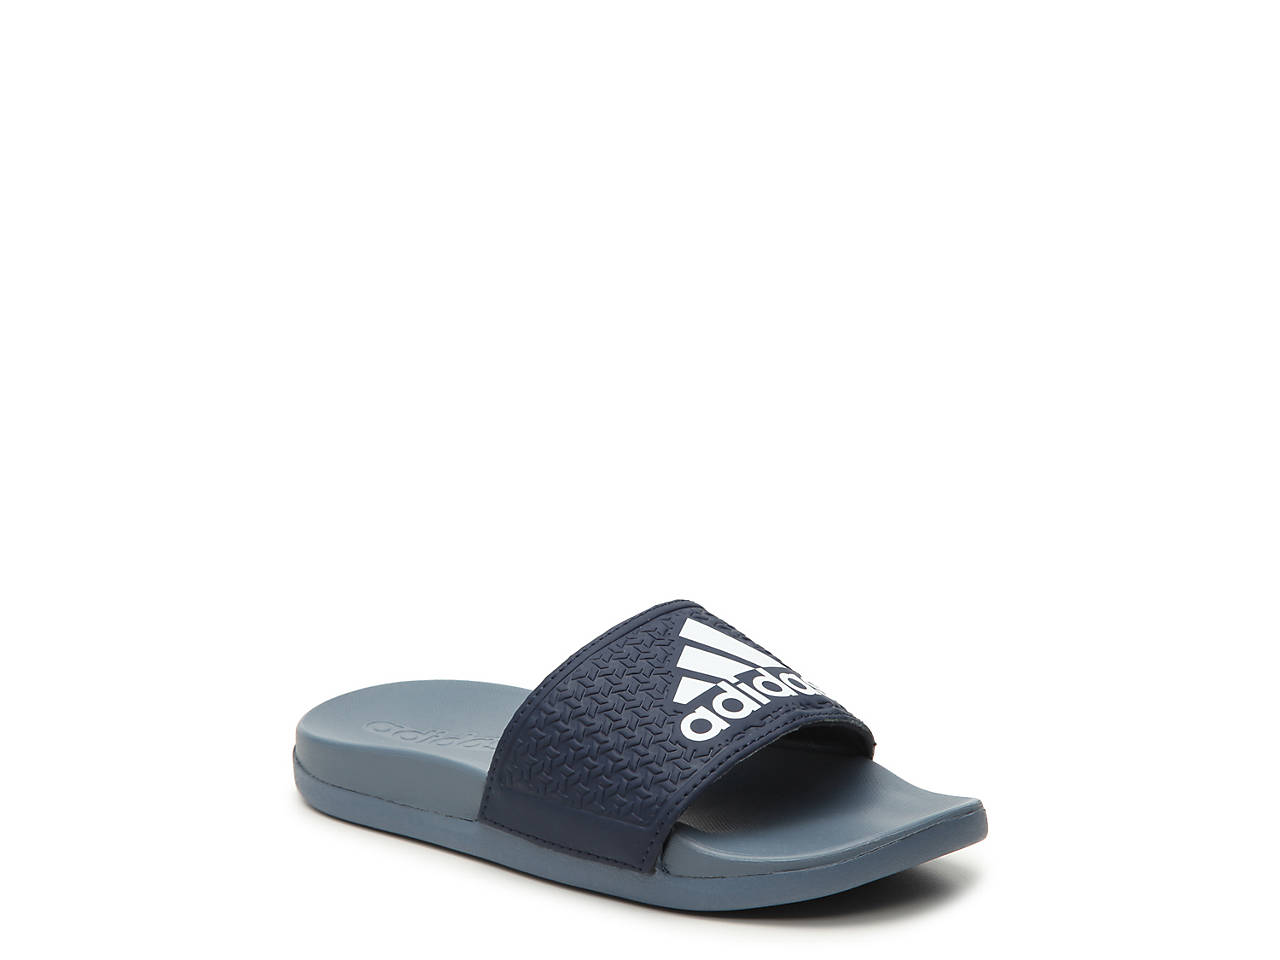 7f3adf1a0137 adidas Adilette Cloudfoam Plus Toddler   Youth Slide Sandal Kids ...